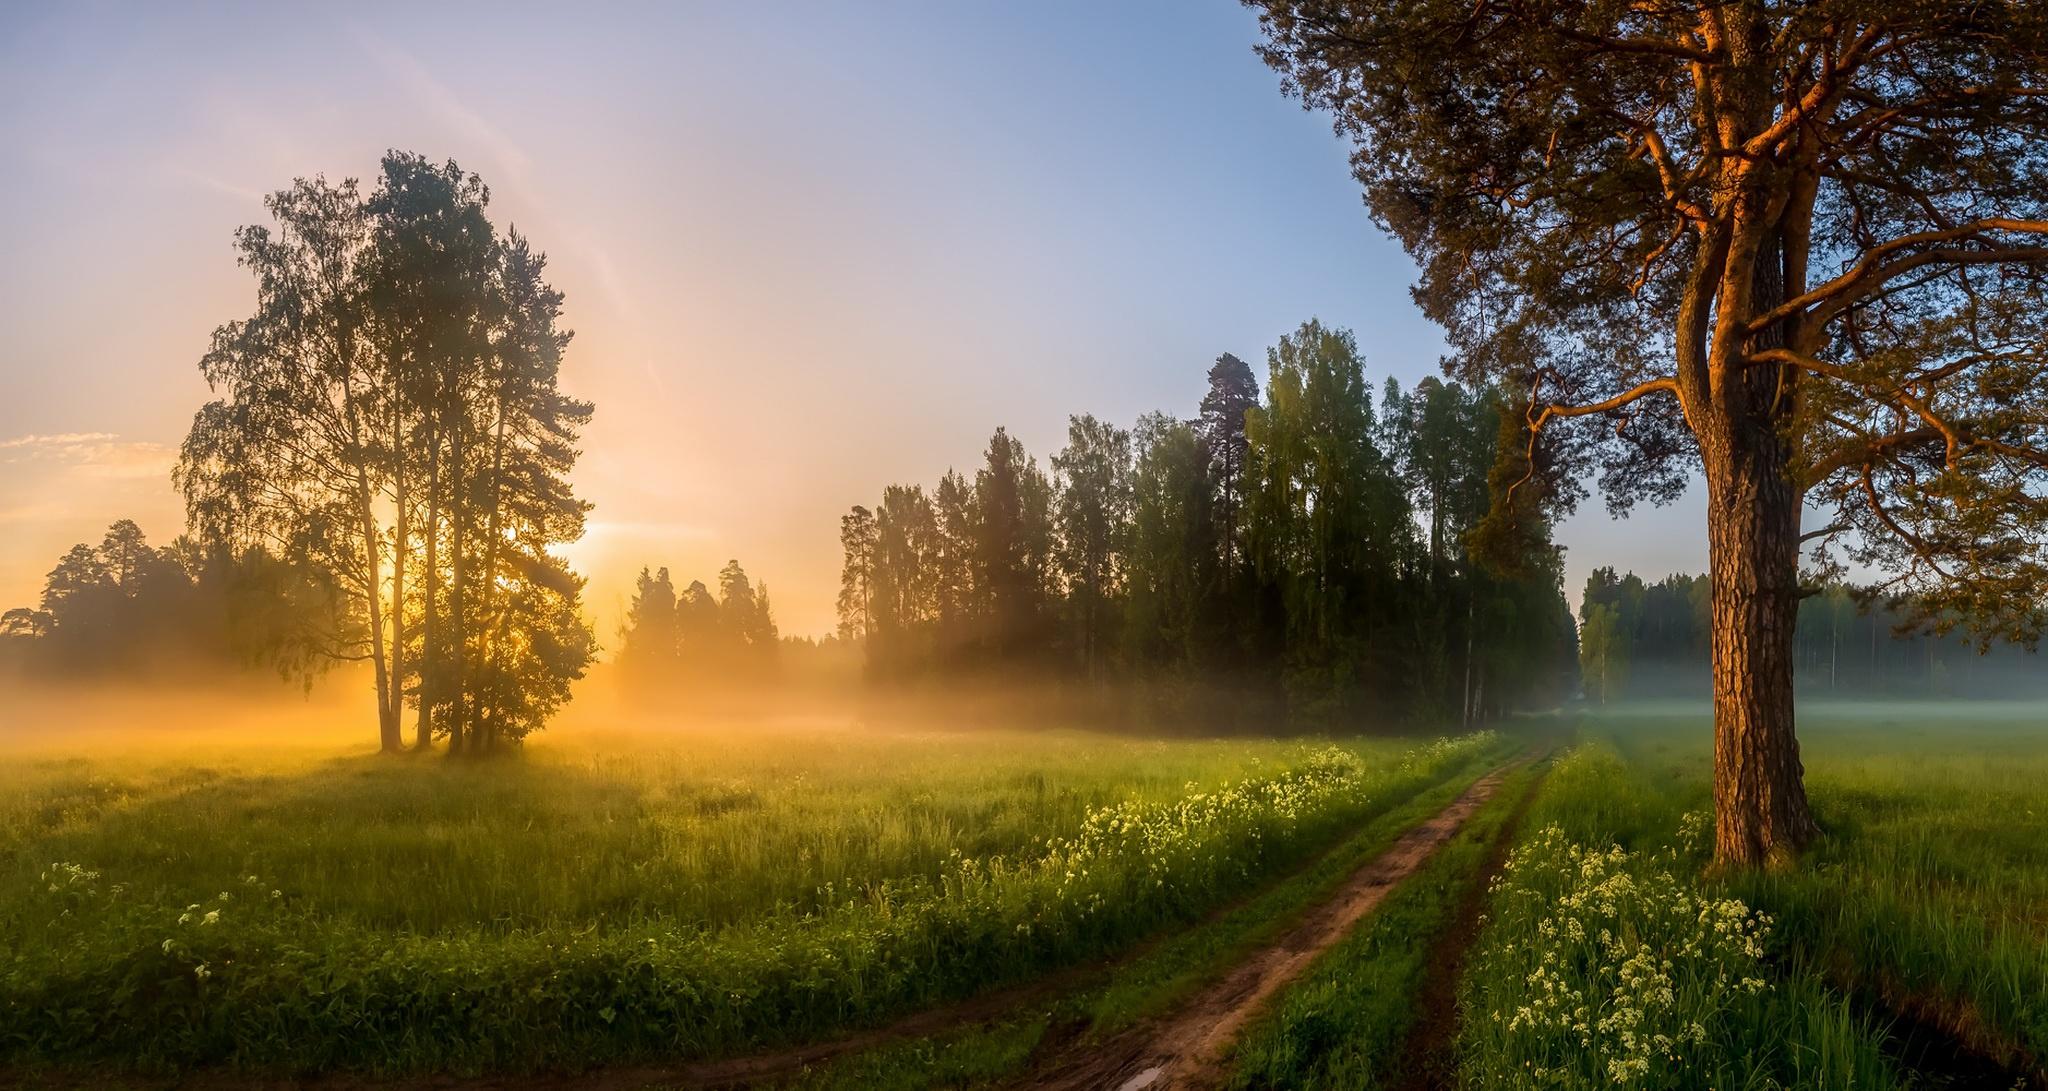 колхозят всякую картинки утренний летний пейзаж забудьте указать, нужно